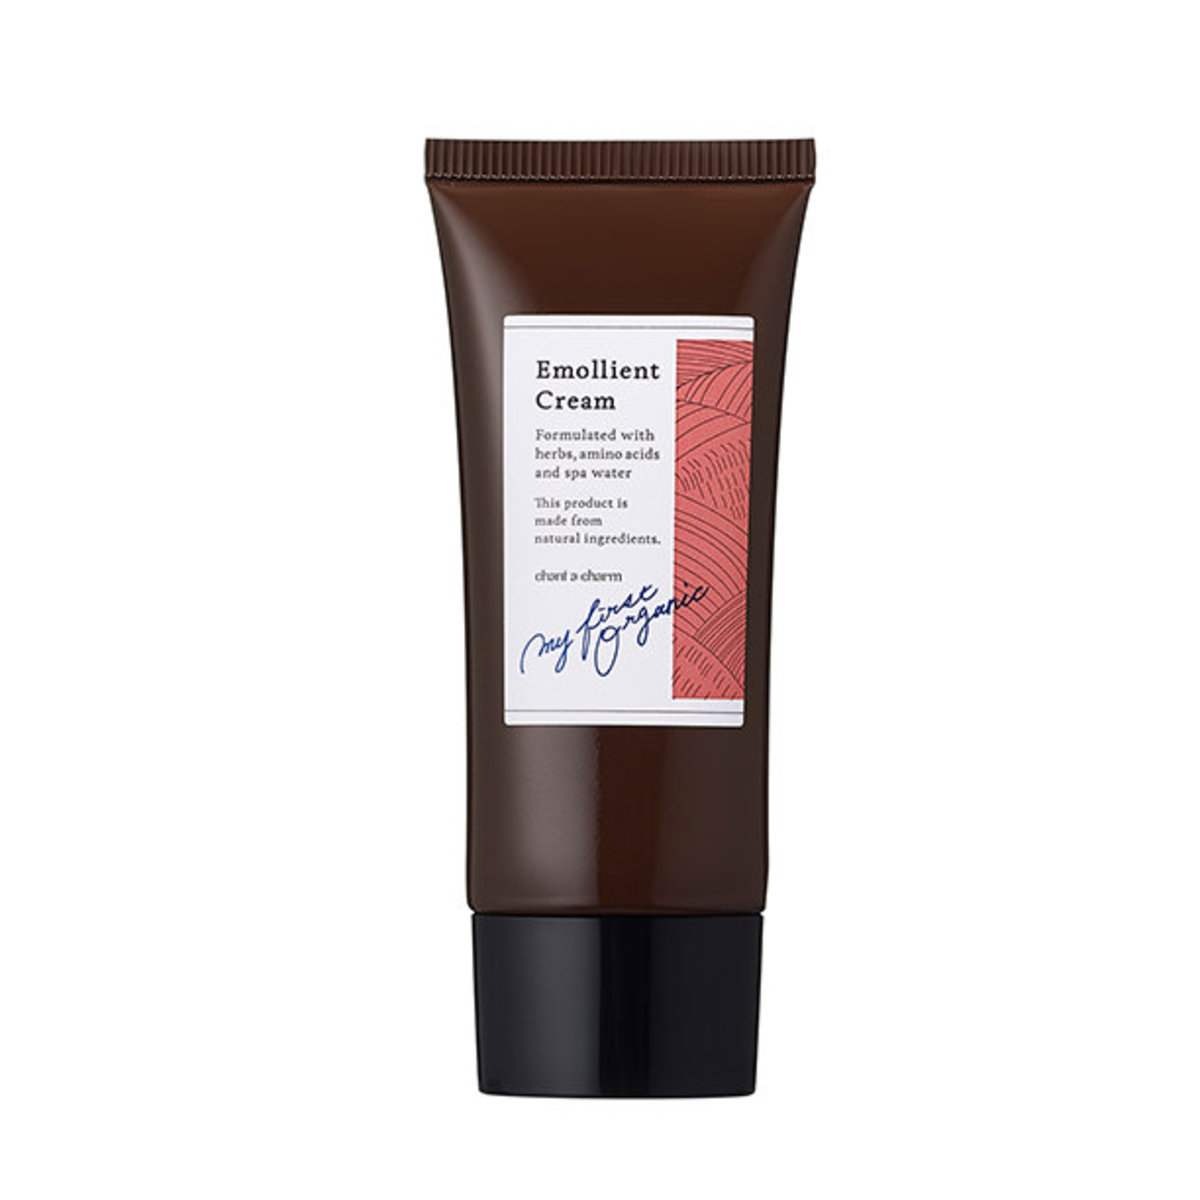 On Sale (JAPAN) Emollient Cream 30g - Expiry : 2021-Jun [Authorized product]